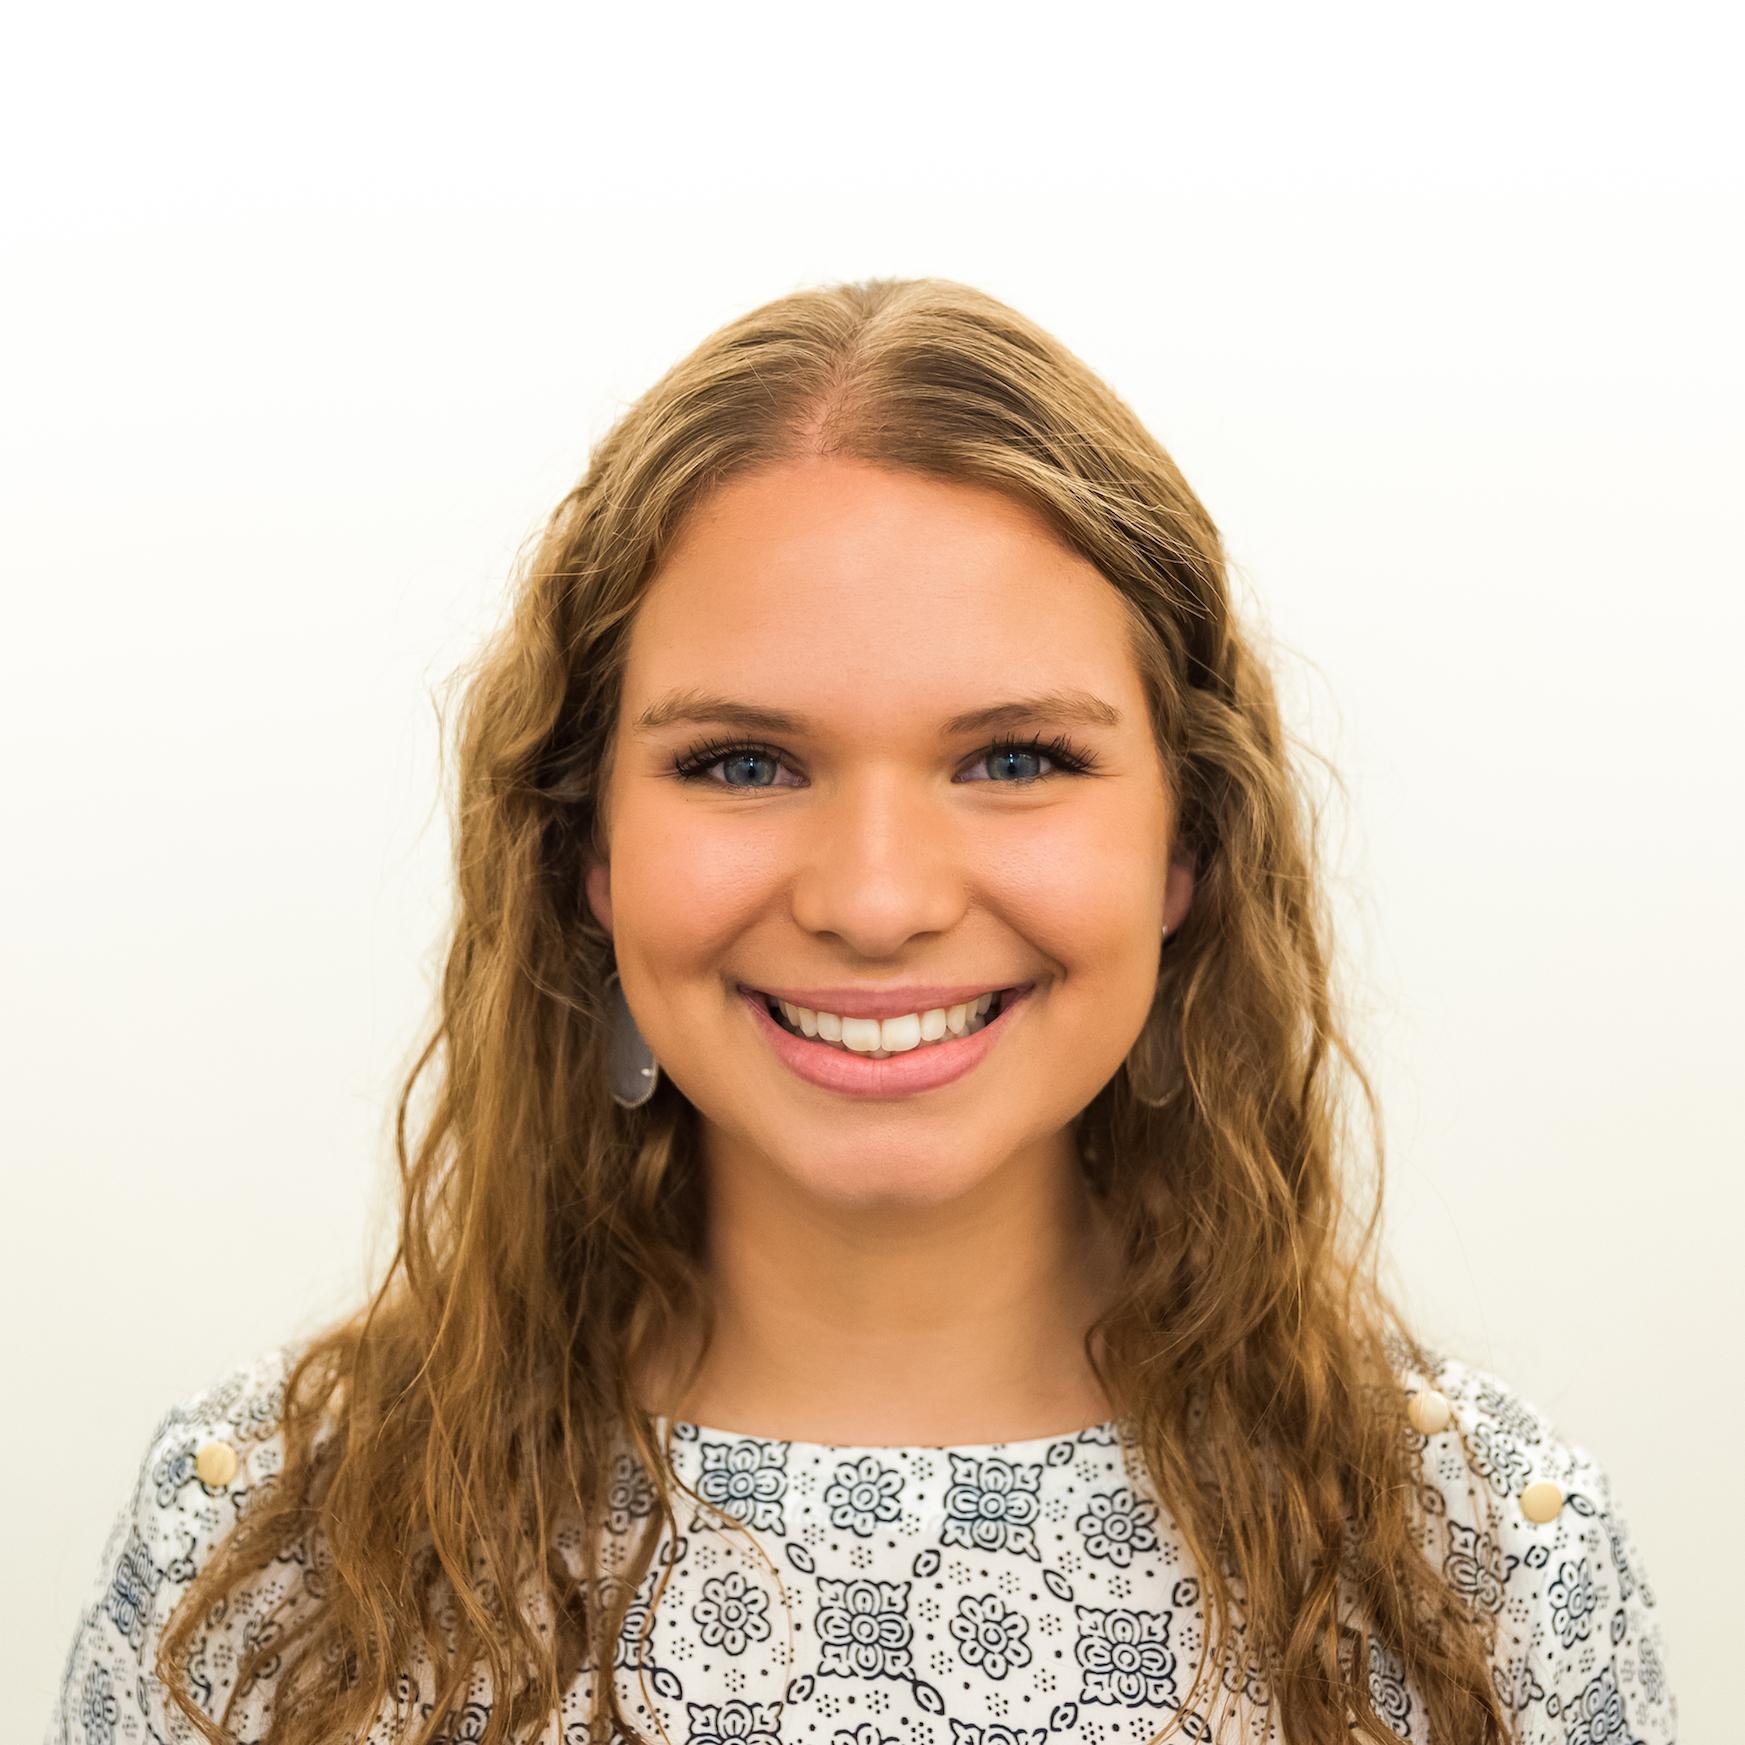 Katie Carter : Politifrog Executive Editor